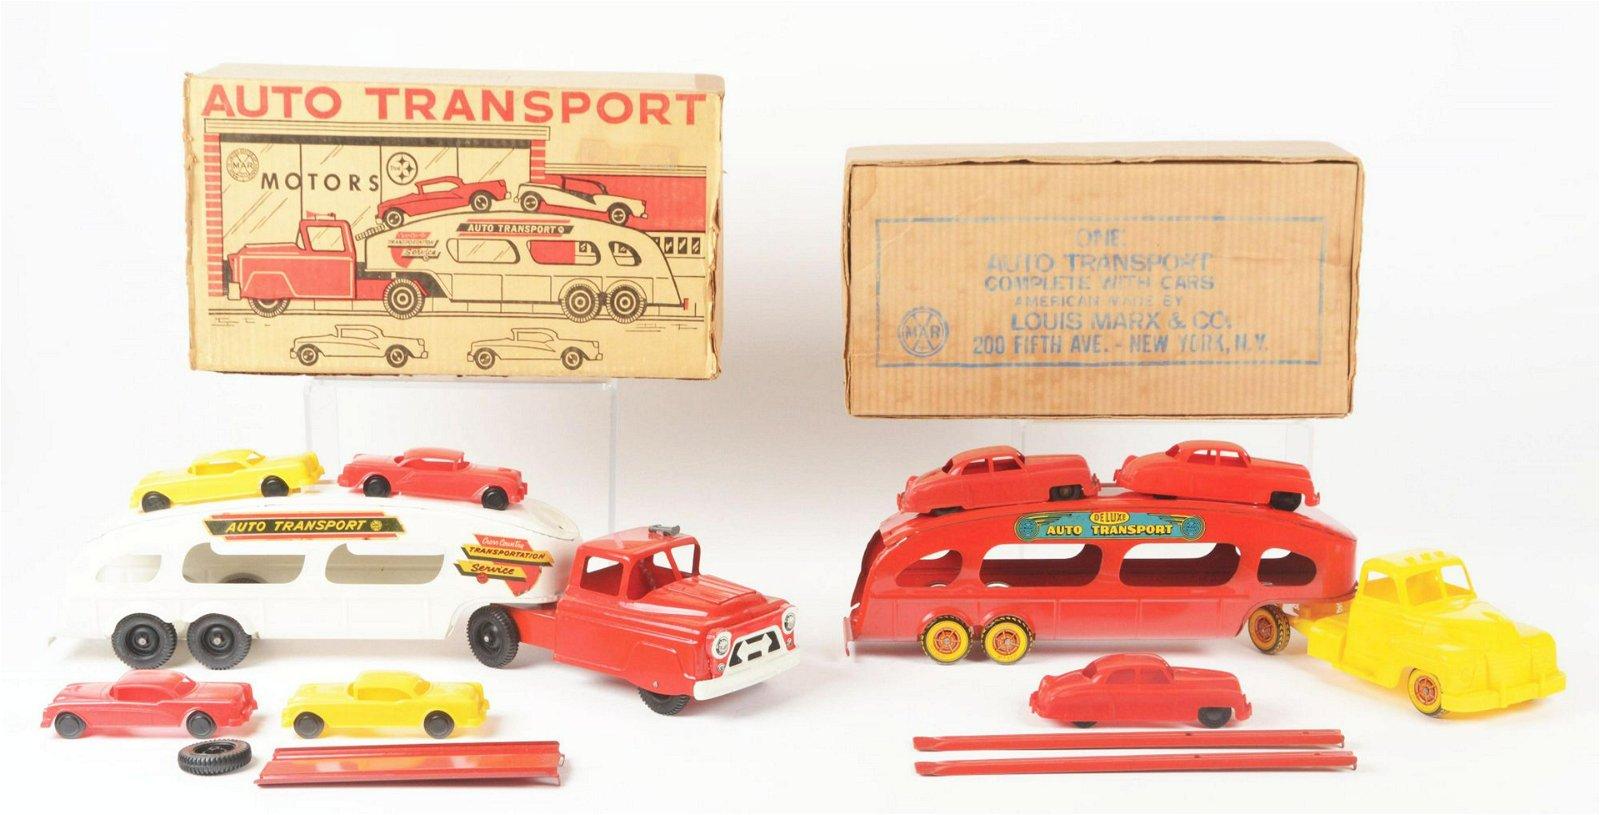 Lot of 2: Marx Pressed Steel Auto Transport Toys.